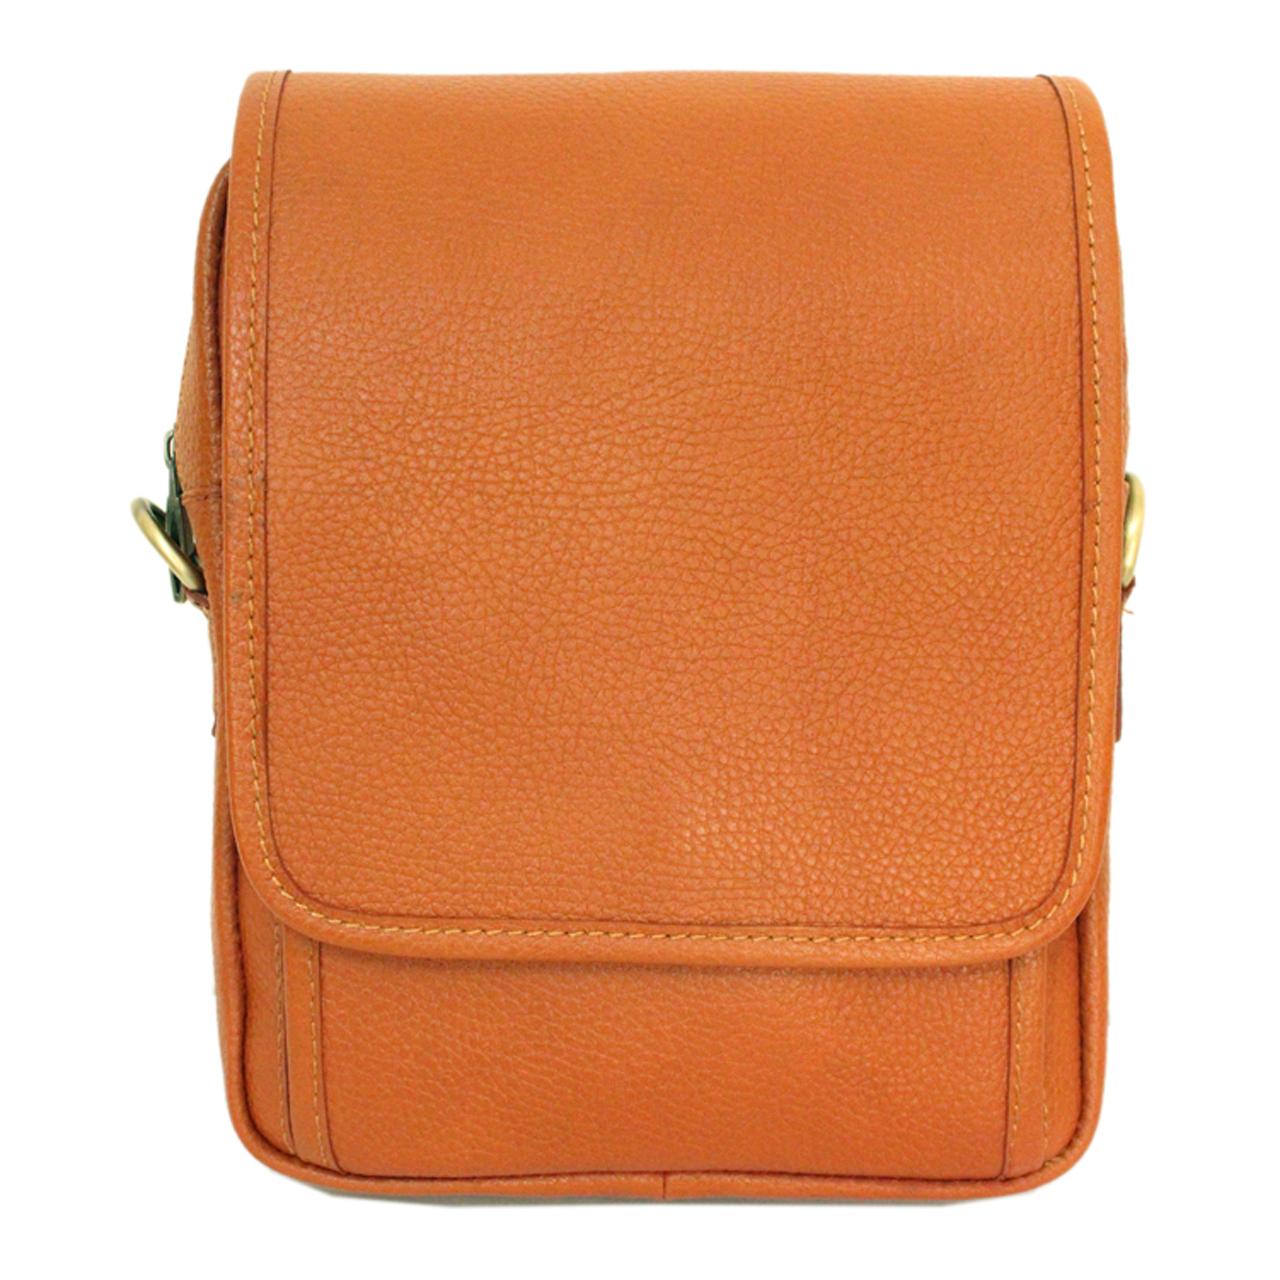 کیف دوشی چرم طبیعی چرم آرا مدل d046